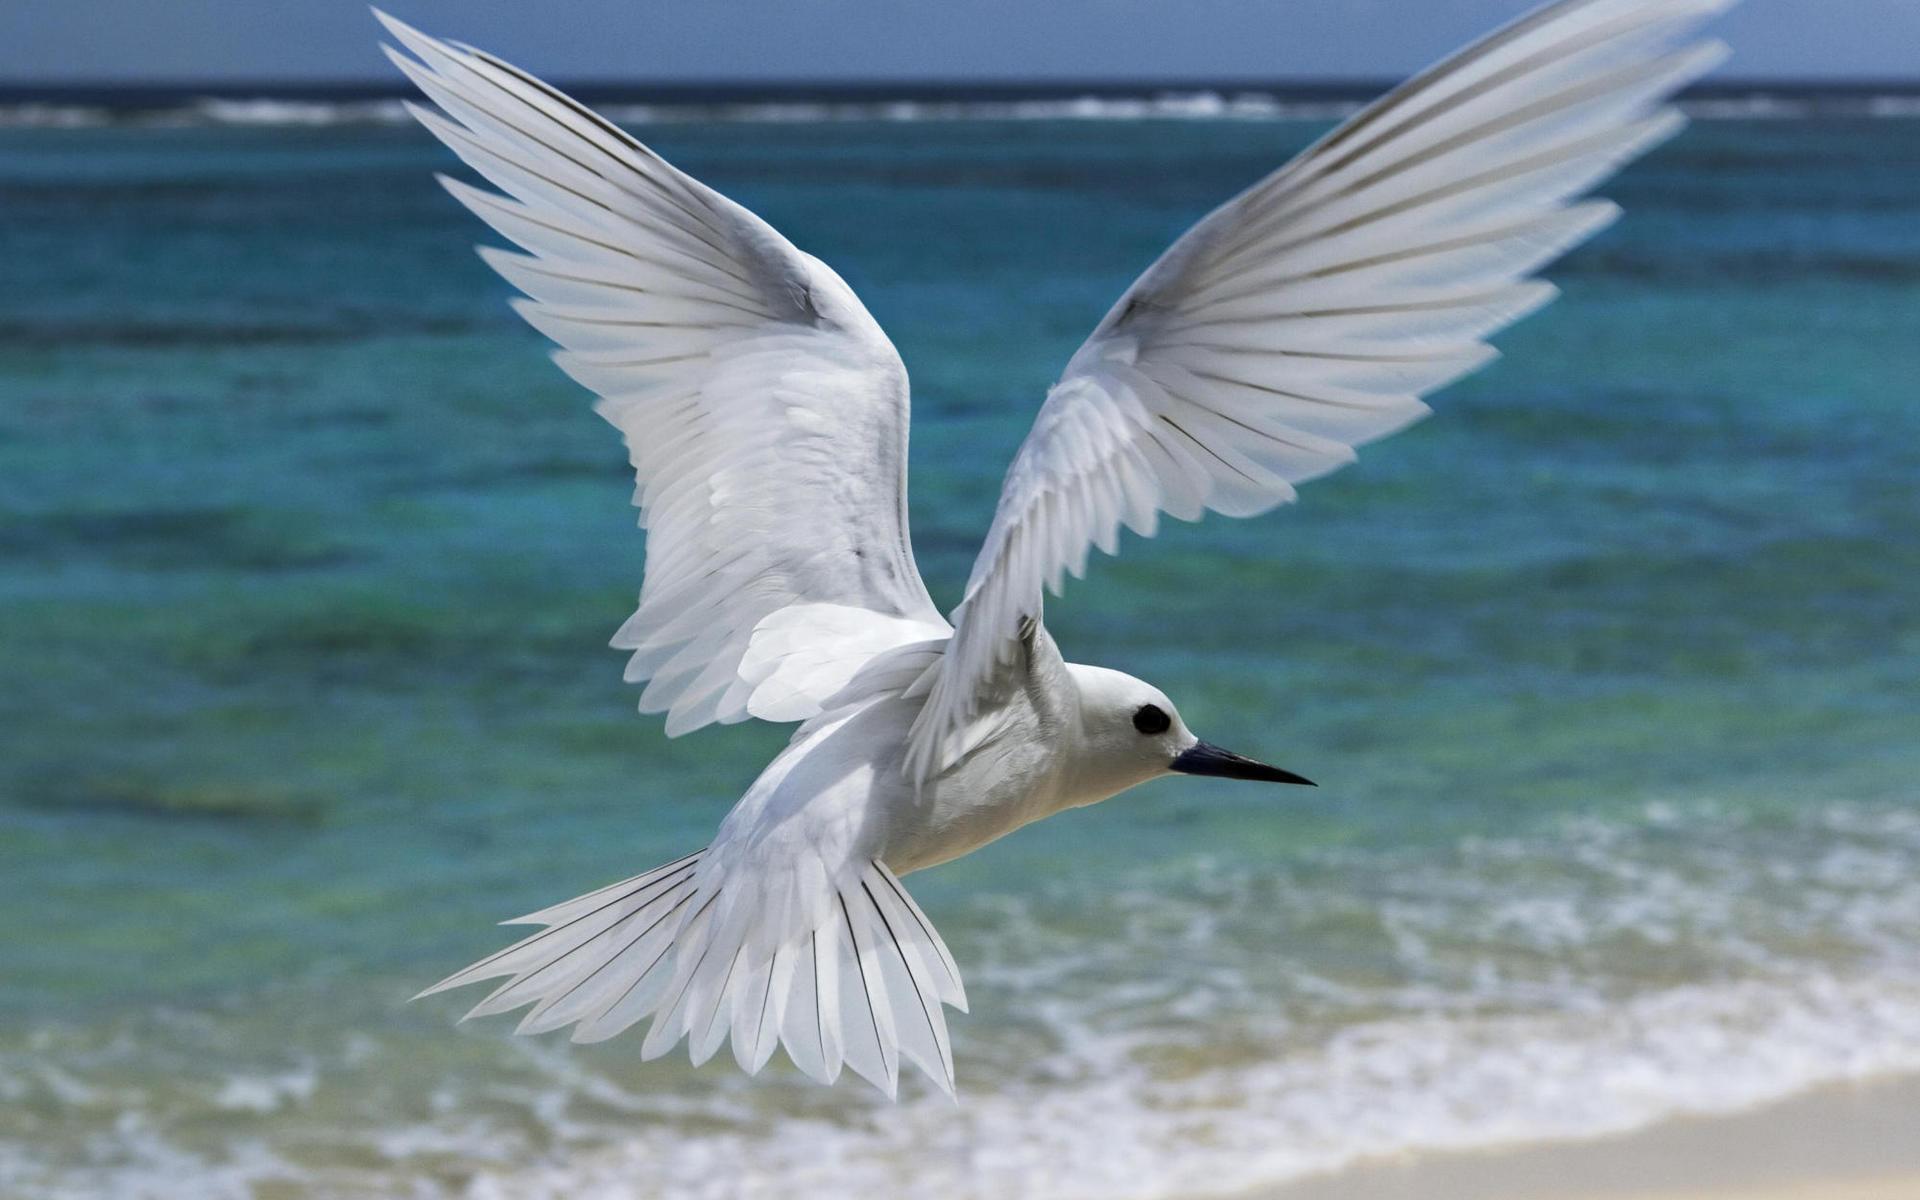 птица, белая, полет